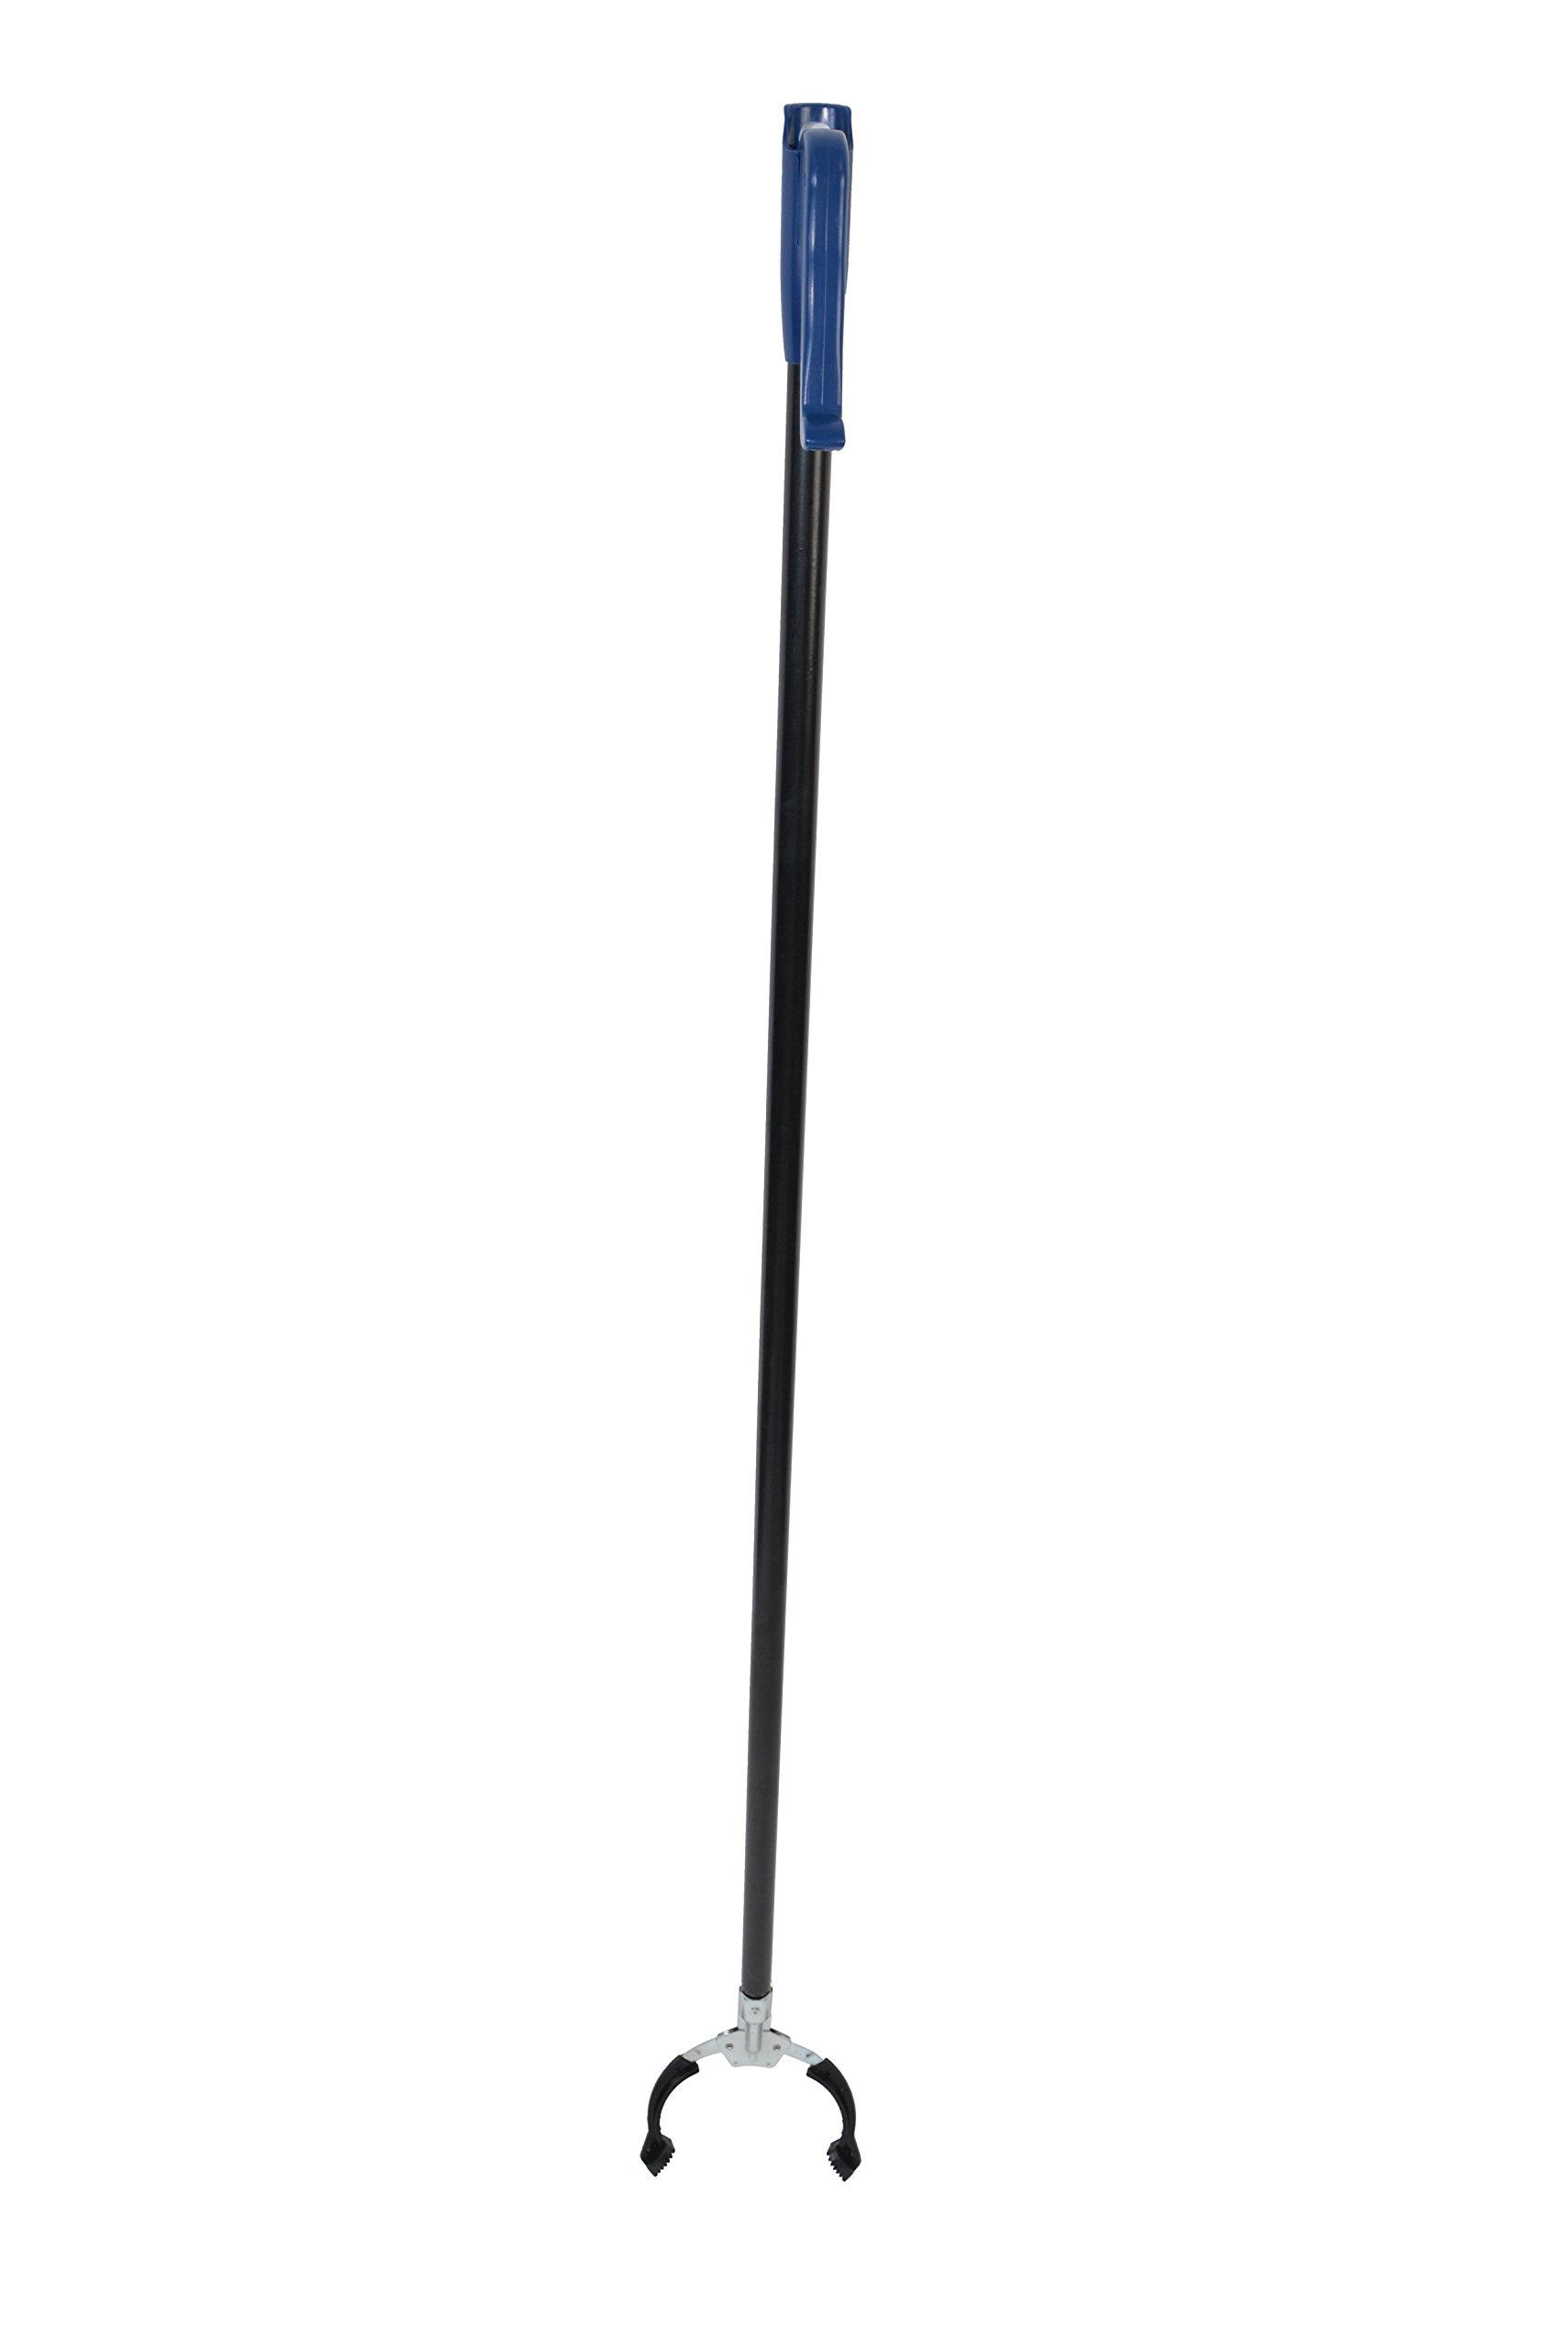 Janico 4871 Grab Reach Tool, Trash Garbage Pick Up Tool, Litter Picker, Pick Up Reaching Claw, 51 Inch Long, Black